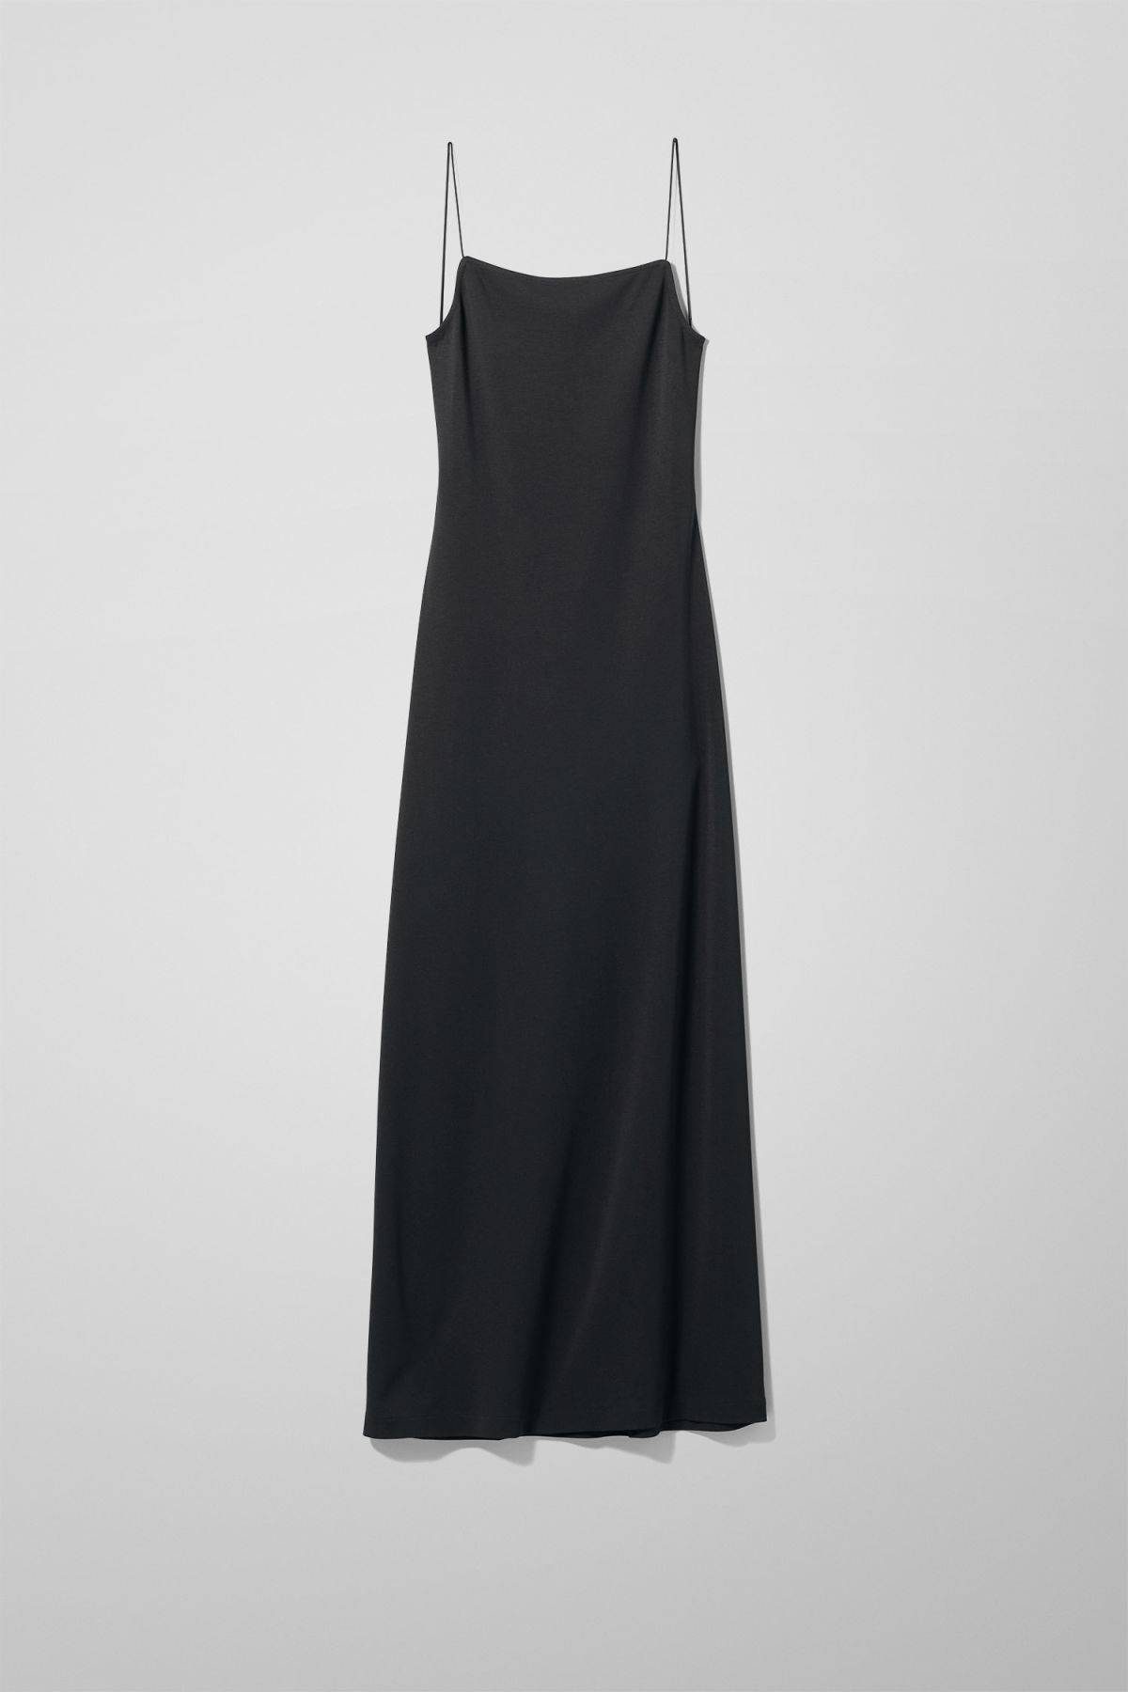 Image of Kiara Dress - Black-M